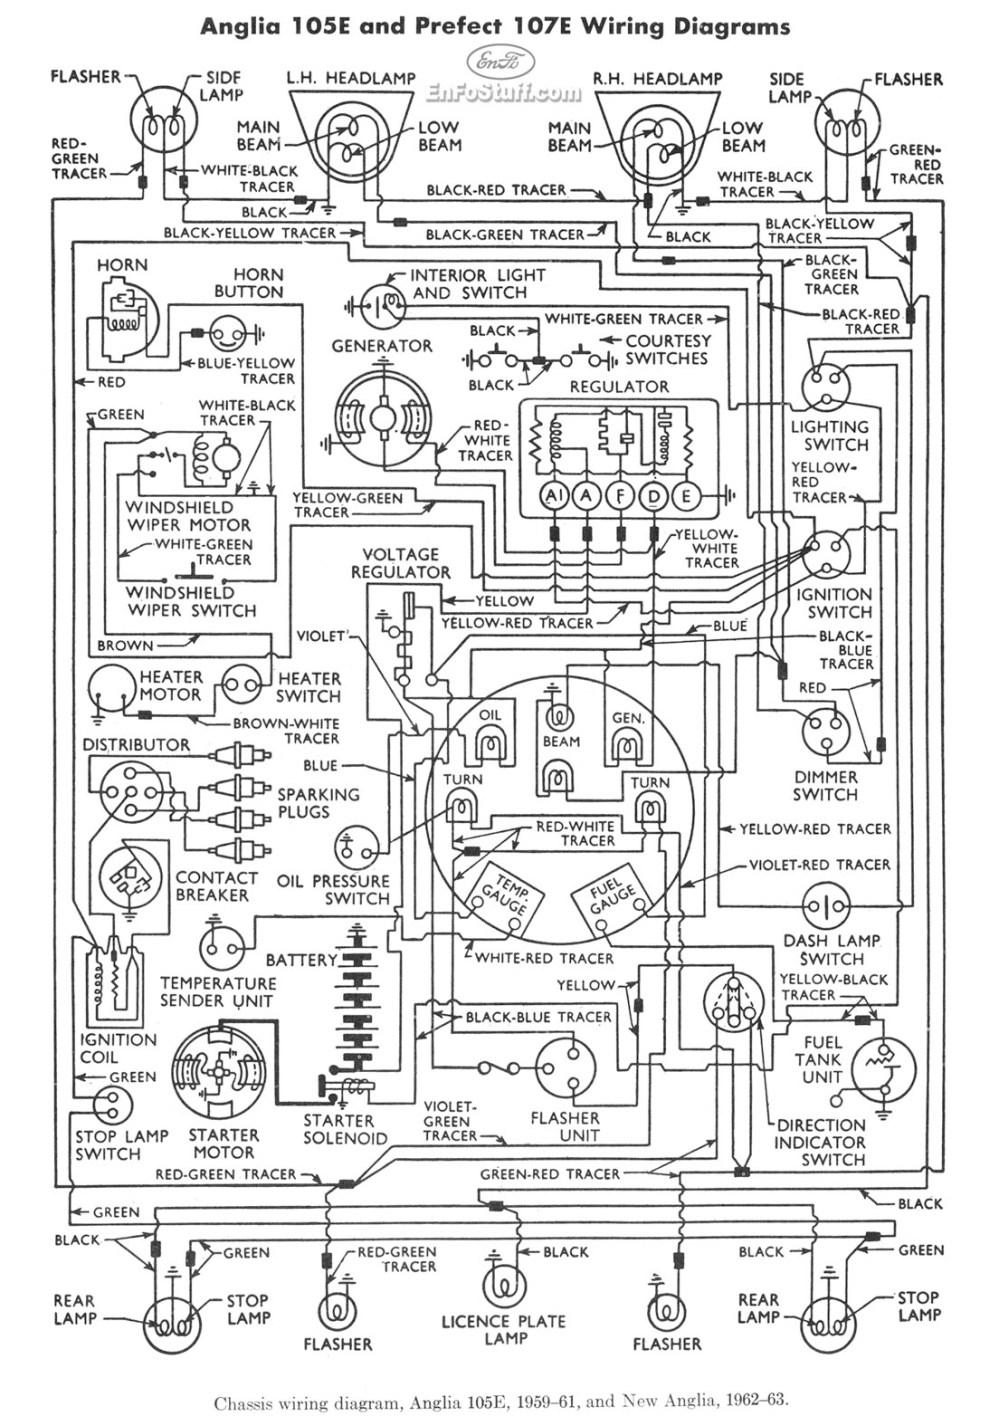 medium resolution of wiring diagram for ford anglia 105e 1959 61 and new anglia 1962 63